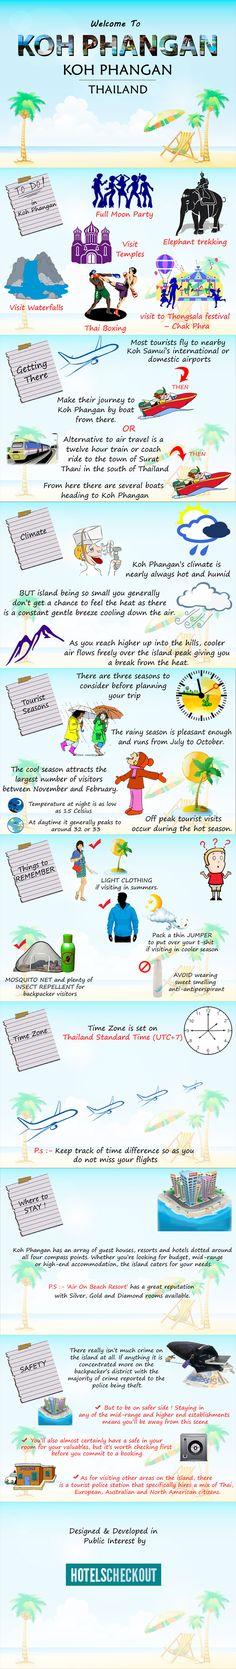 Koh Phangan - Holiday Destination of Thailand